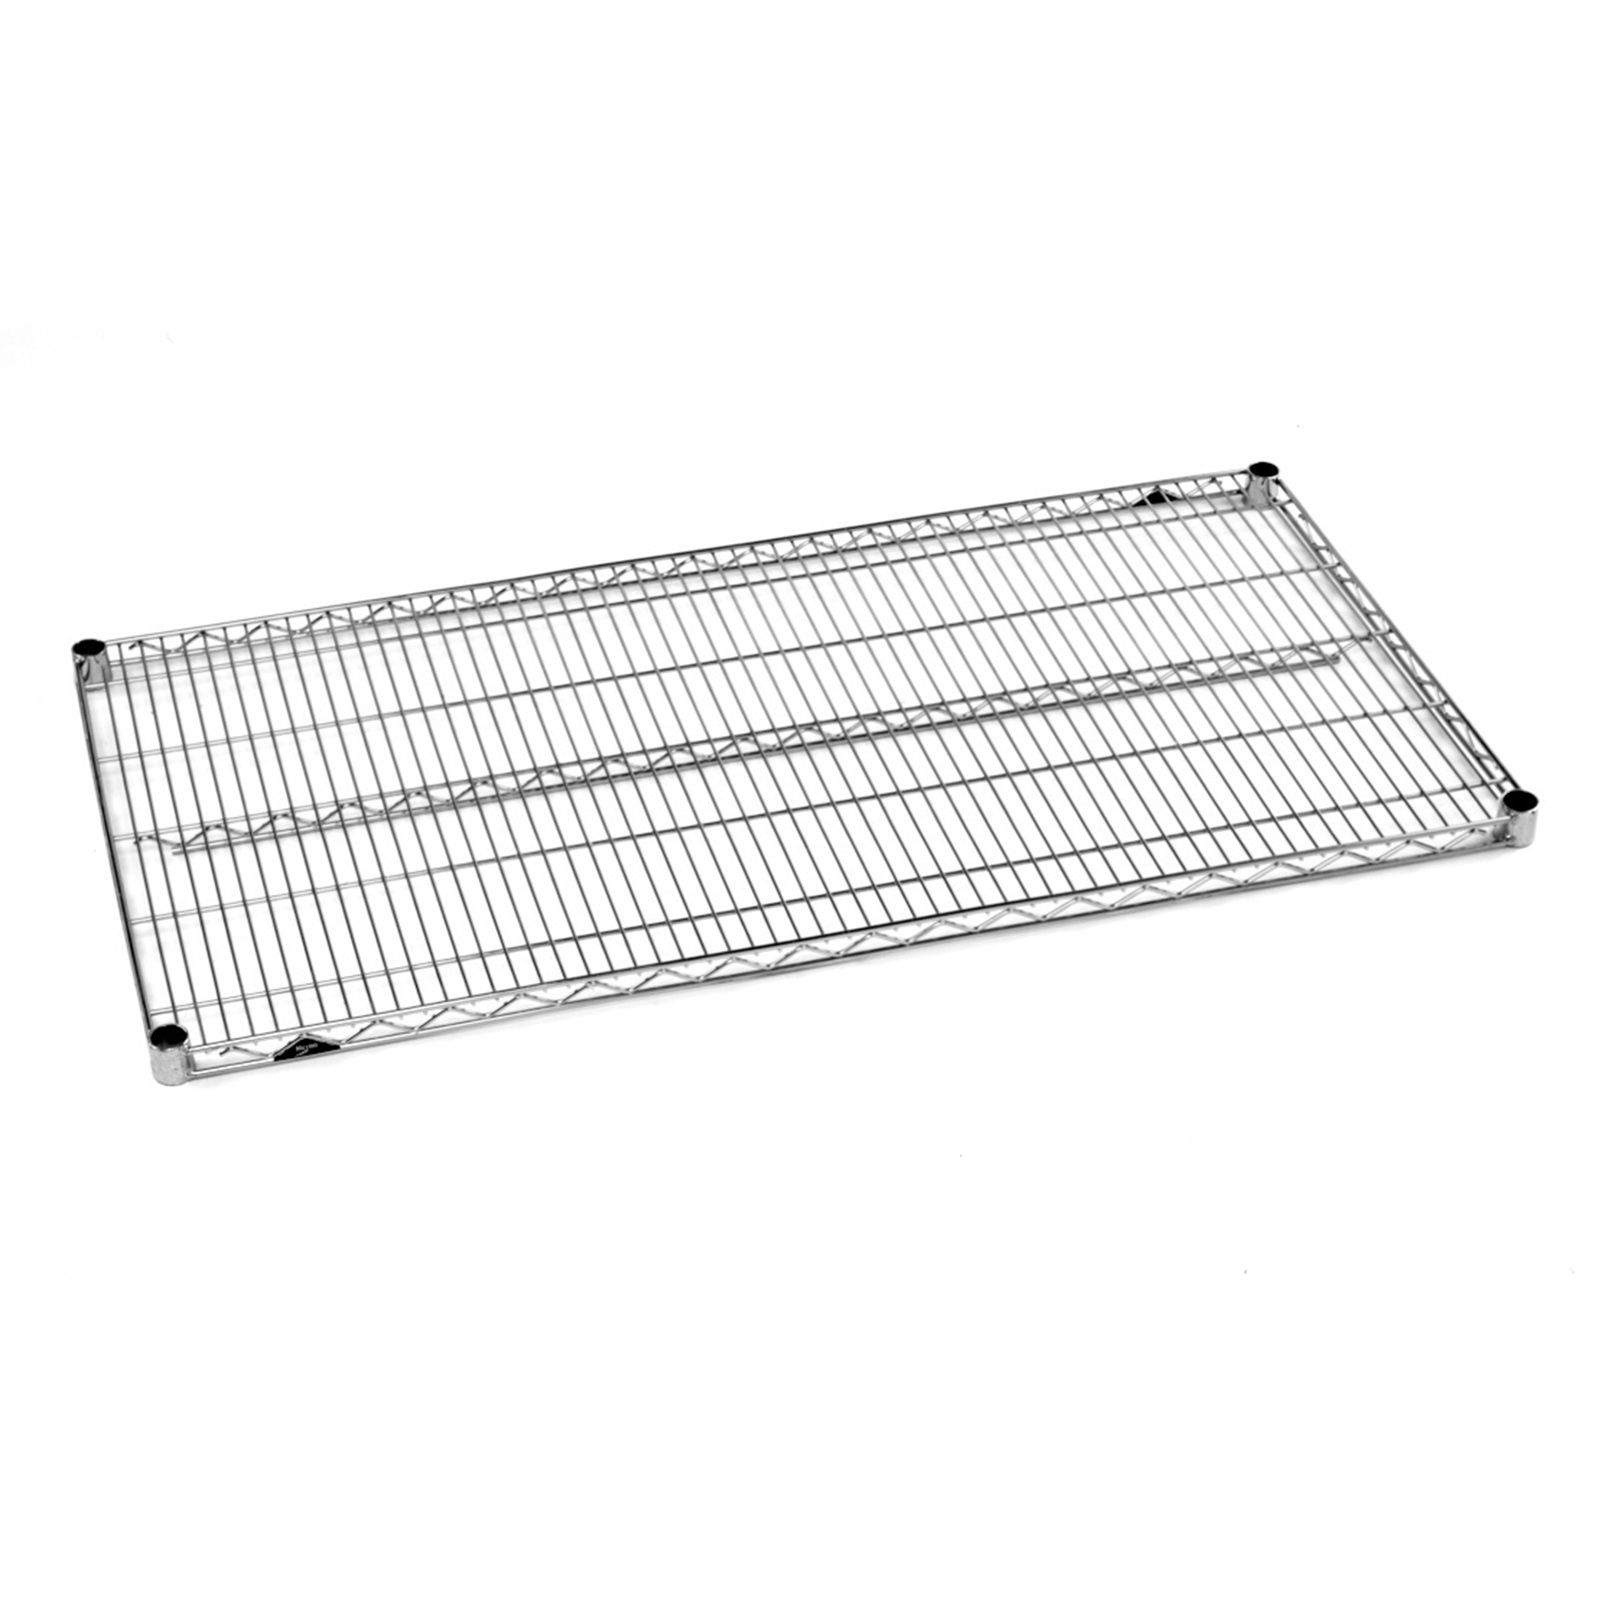 Metro 1448NC shelving, racks & carts/wire shelving/wire shelves